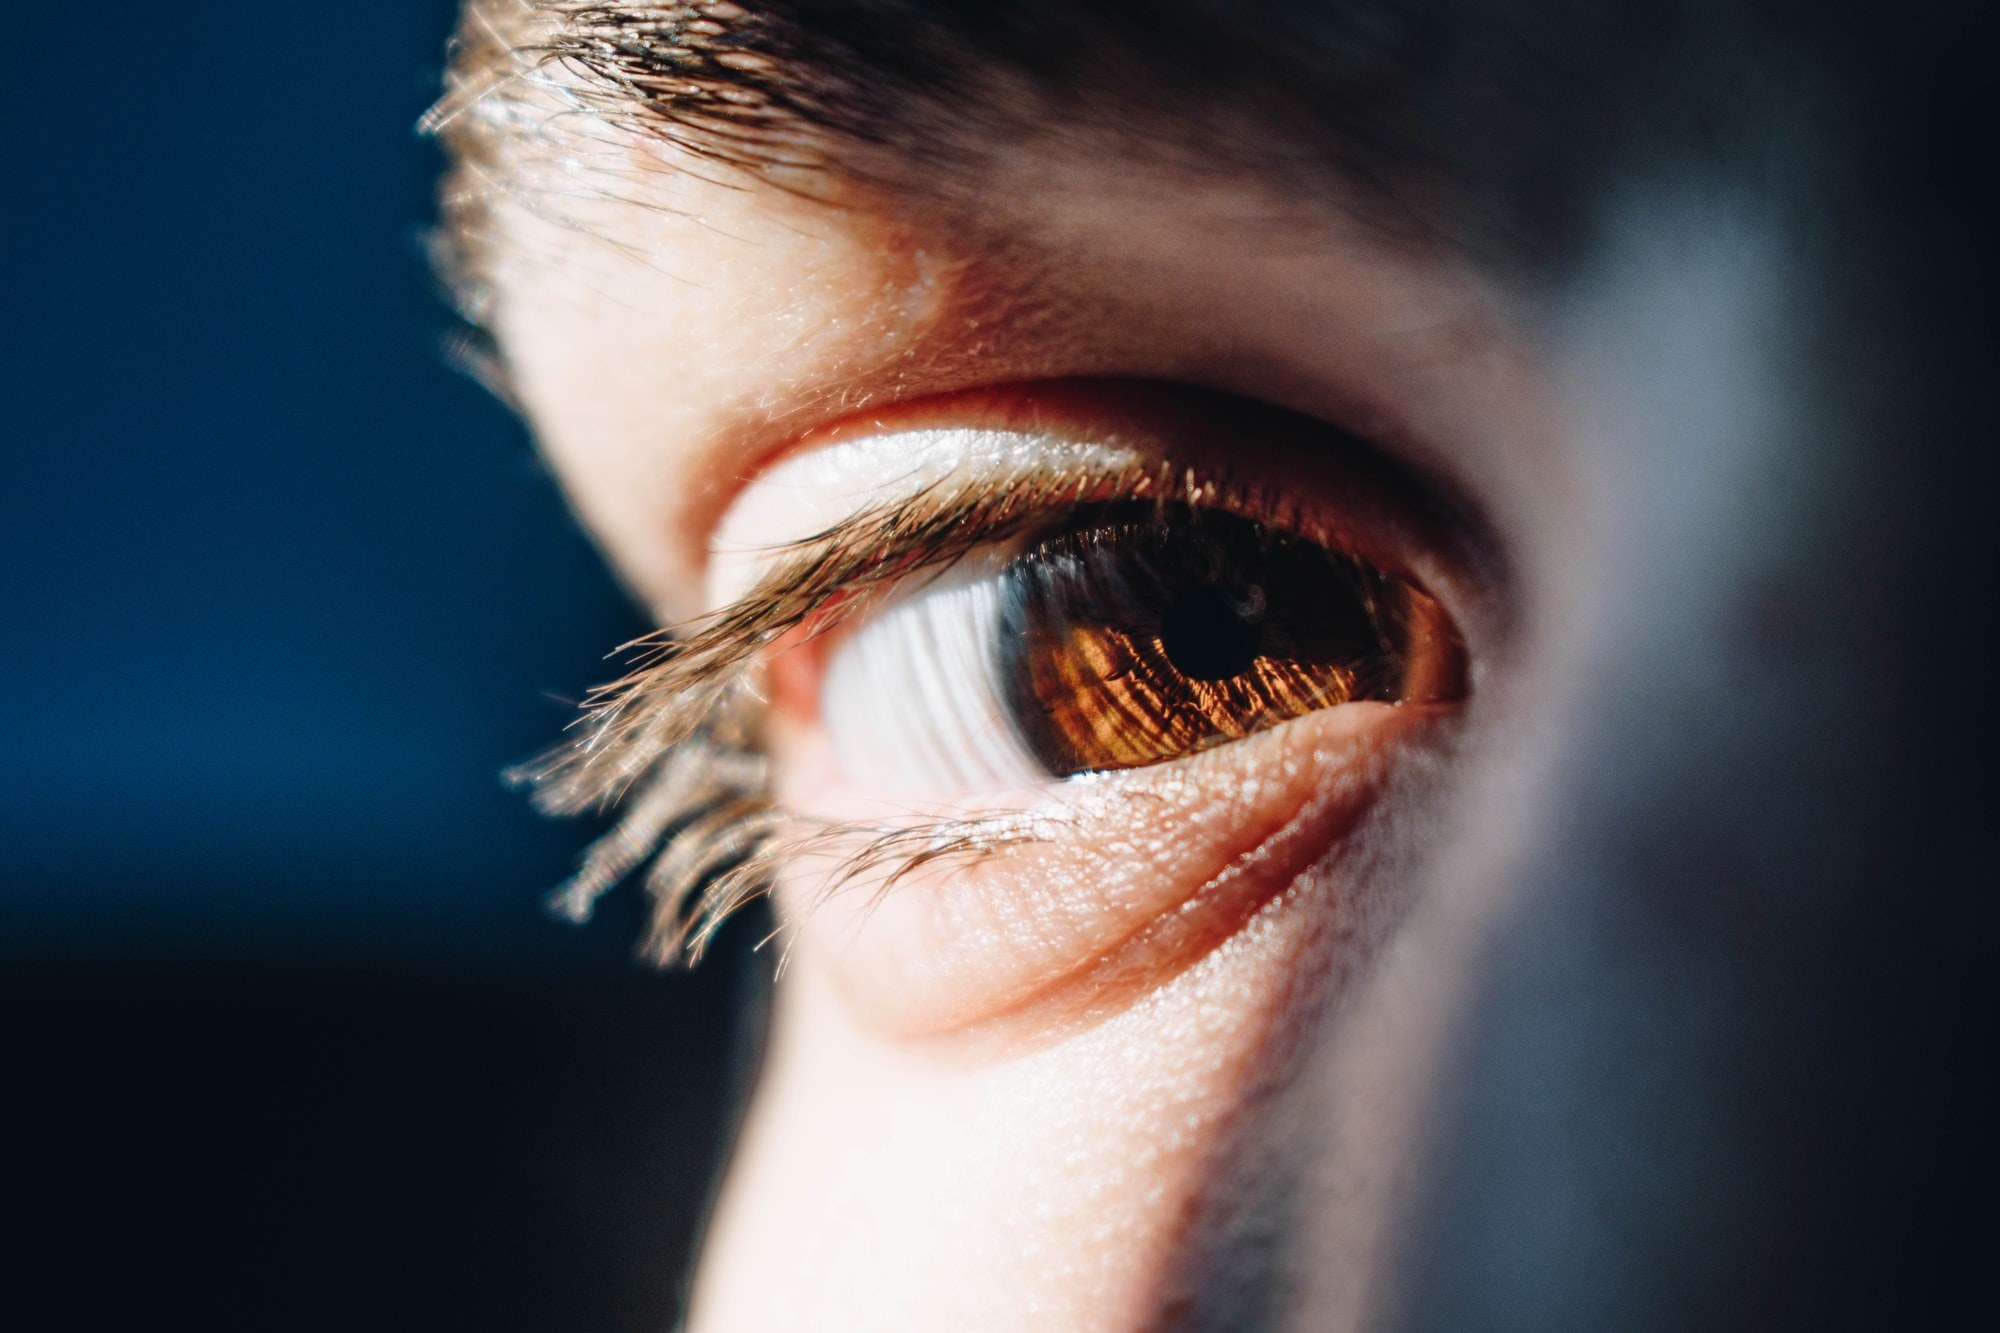 Close up of my eye